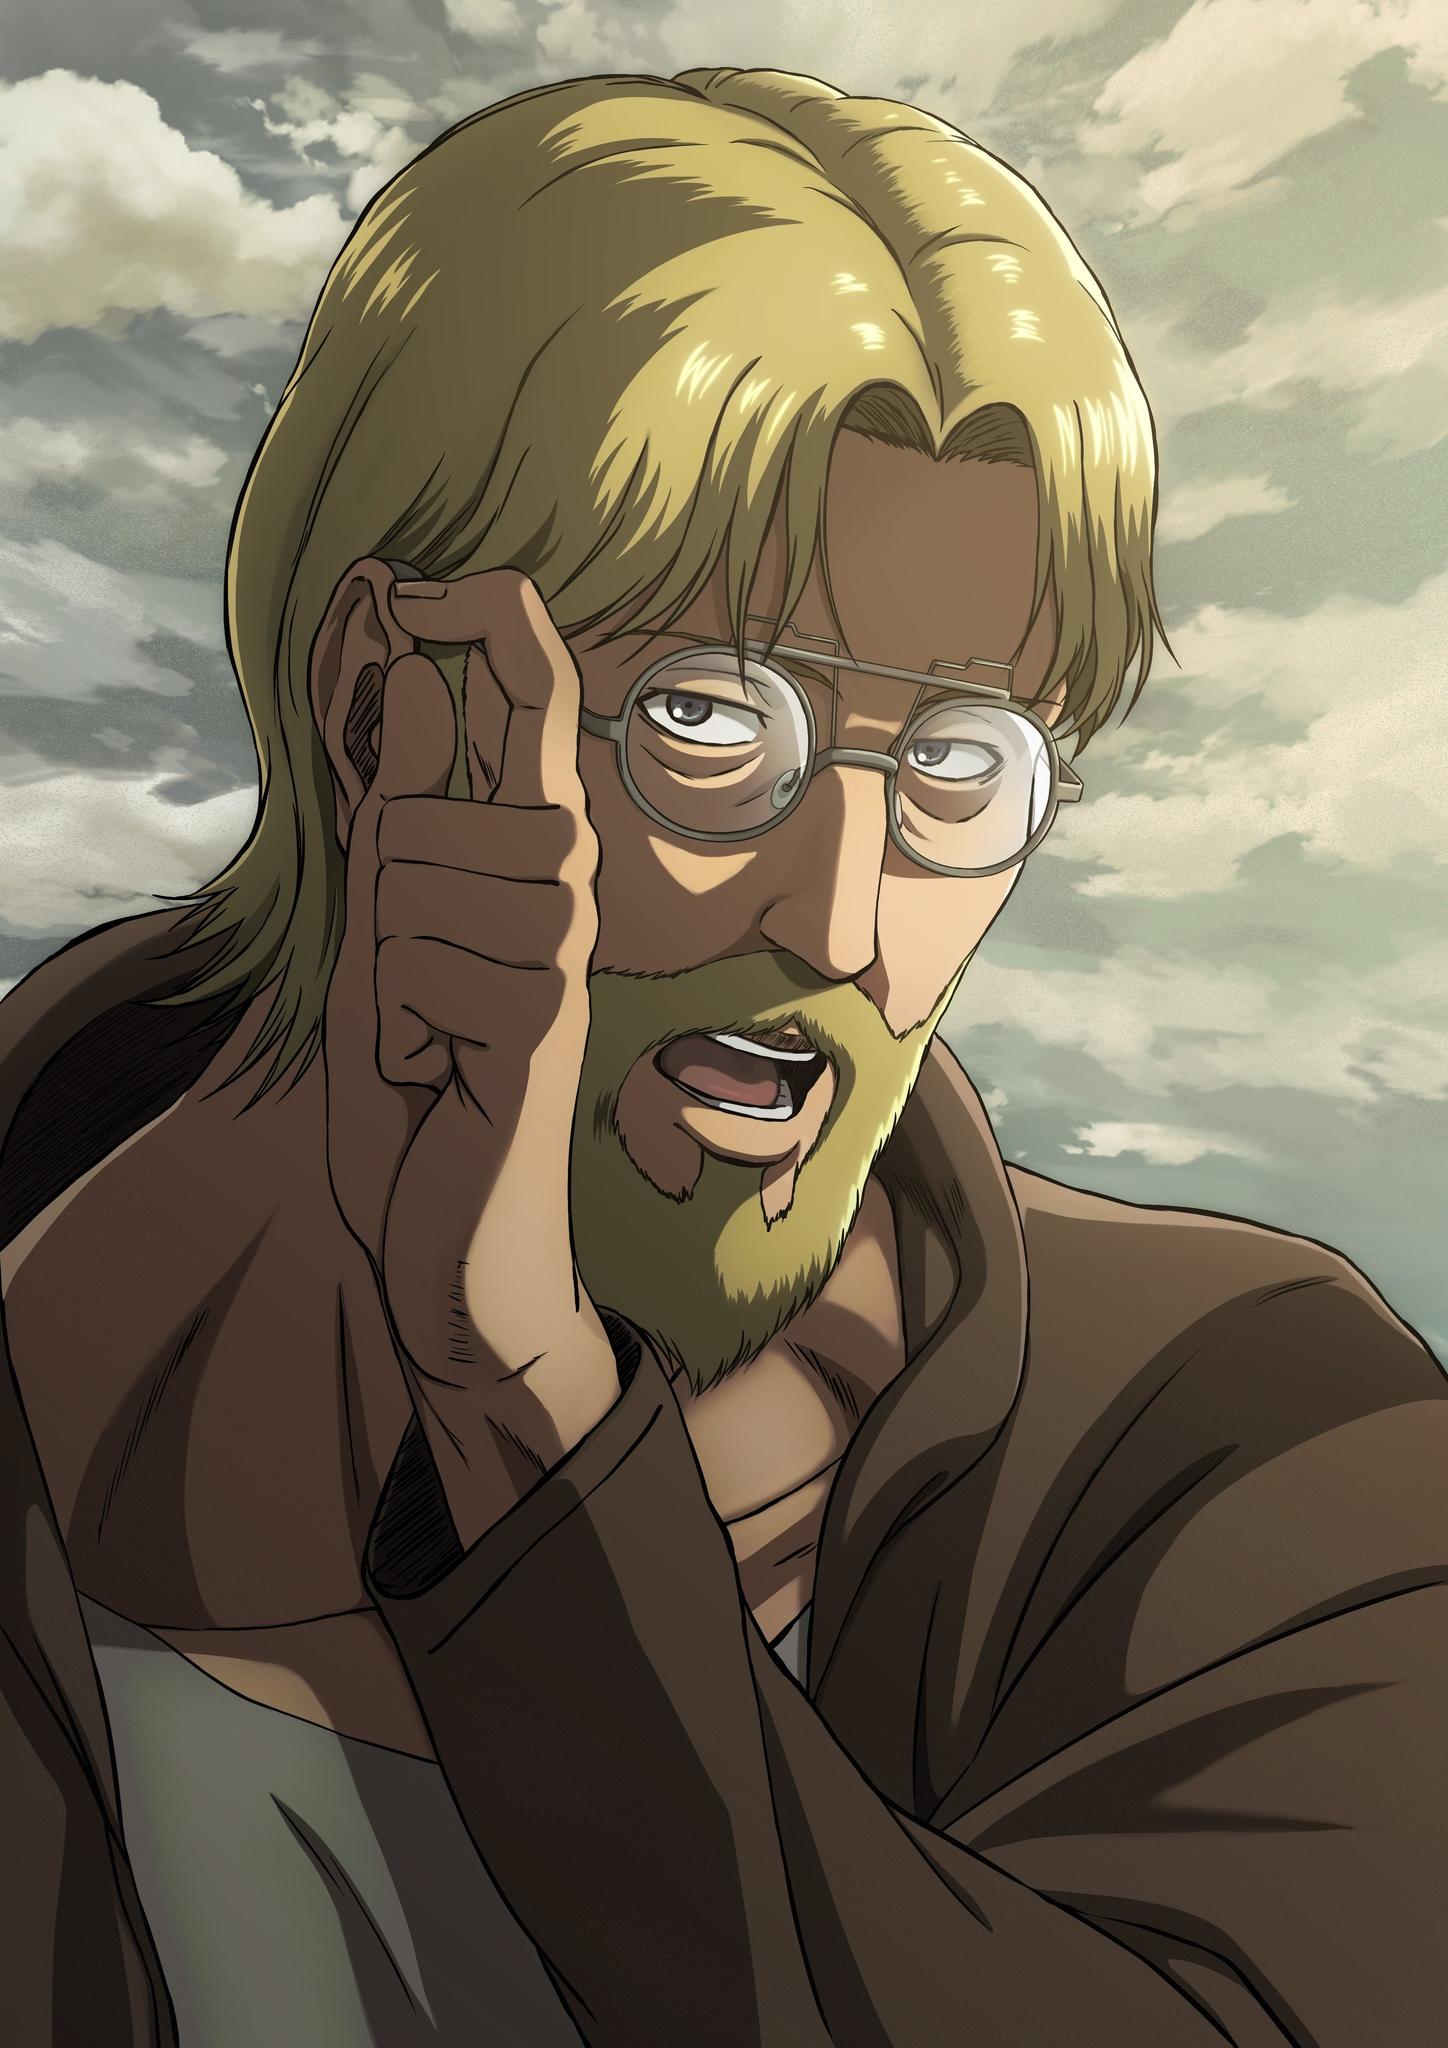 Pinterest in 2020 Attack on titan anime, Attack on titan